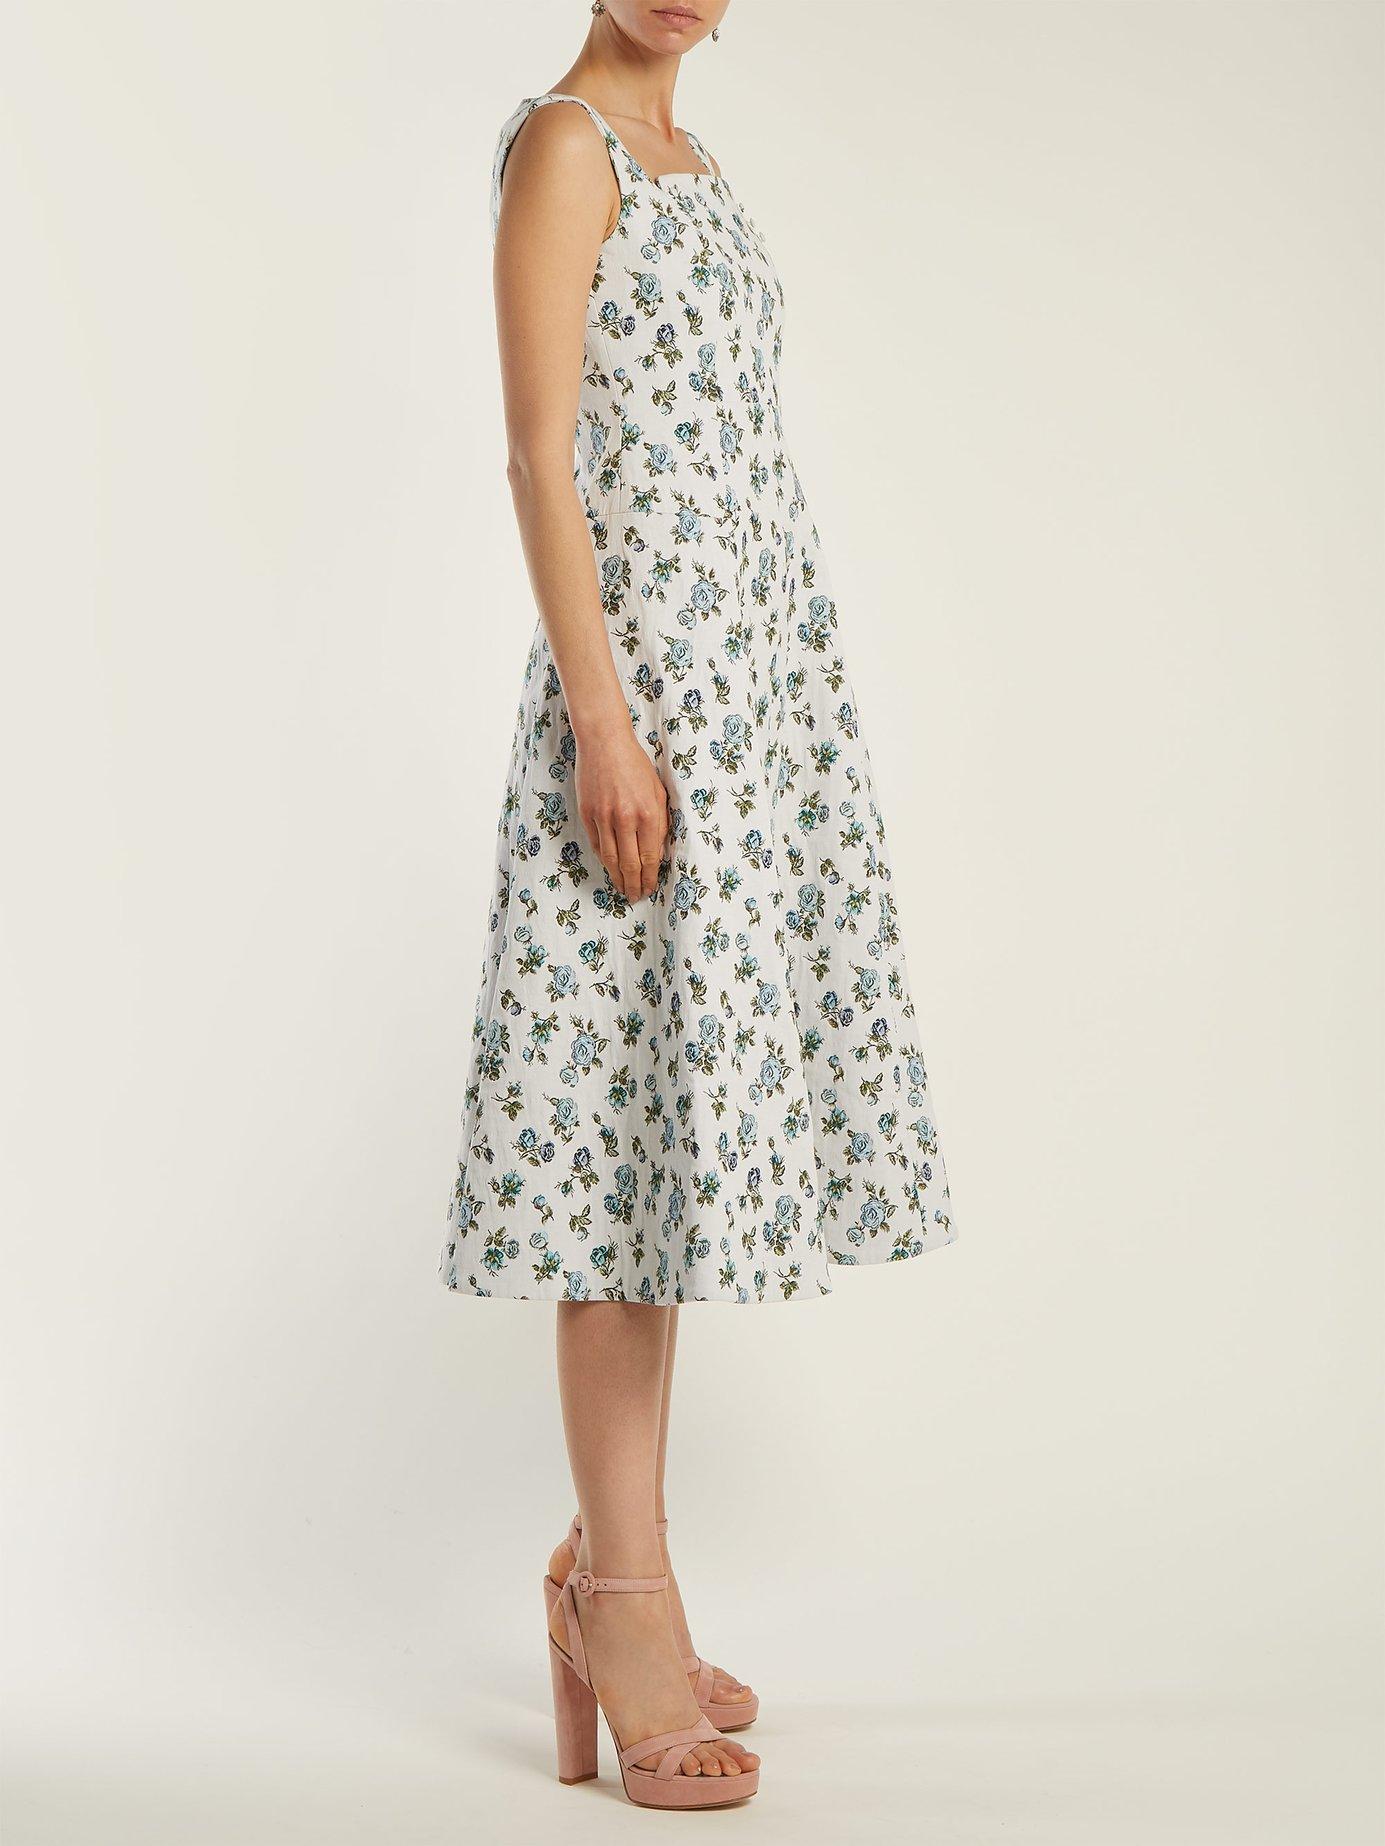 Polly floral-jacquard dress by Erdem